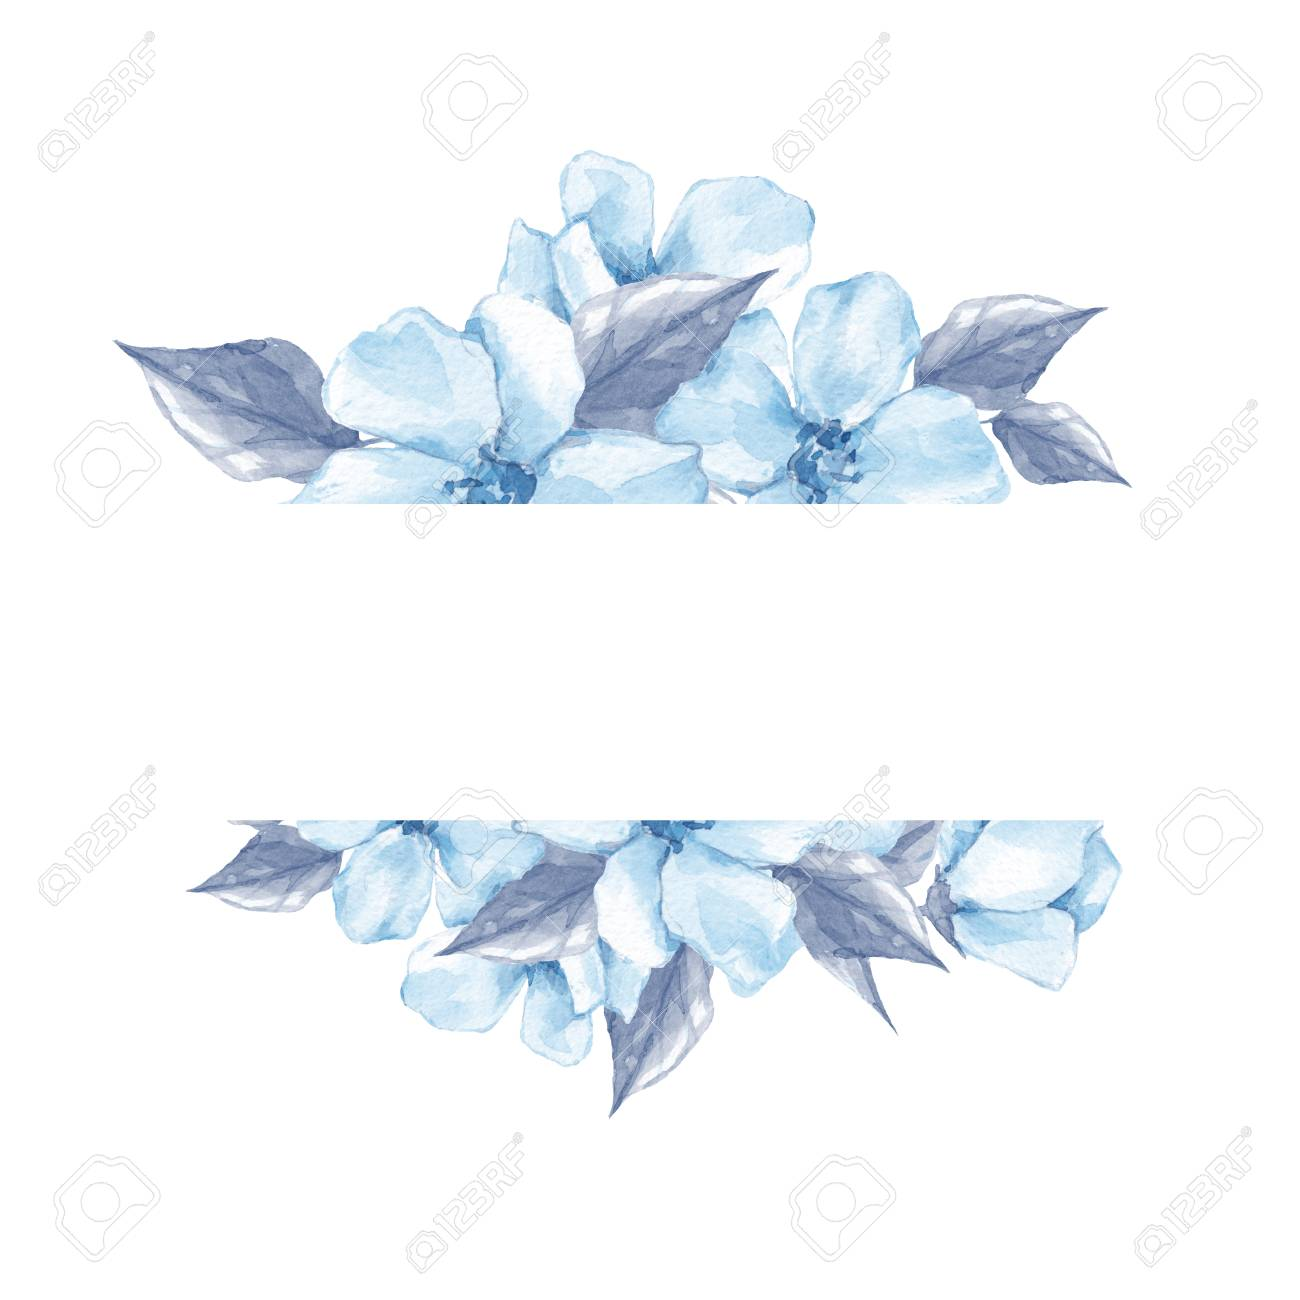 Watercolor Floral Frame 2 Element For Design Watercolor Blue